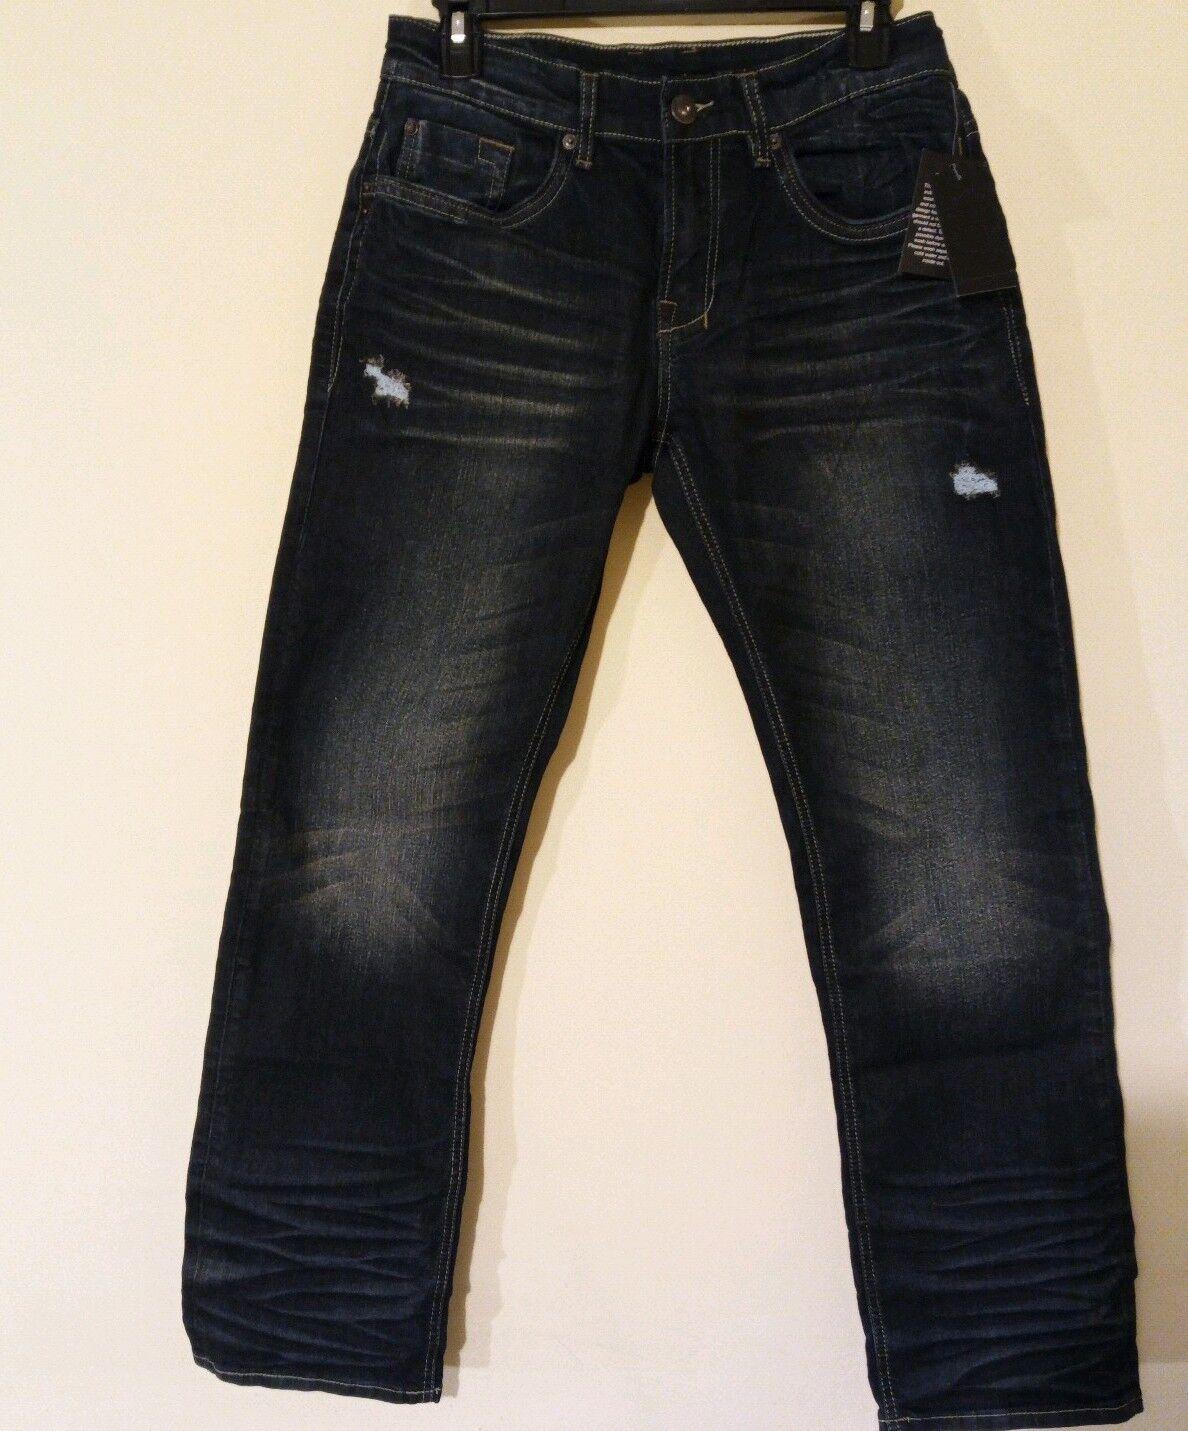 Mens New Buffalo David Bitton Evan X Slim Straight Jeans Indigo 30W 30L